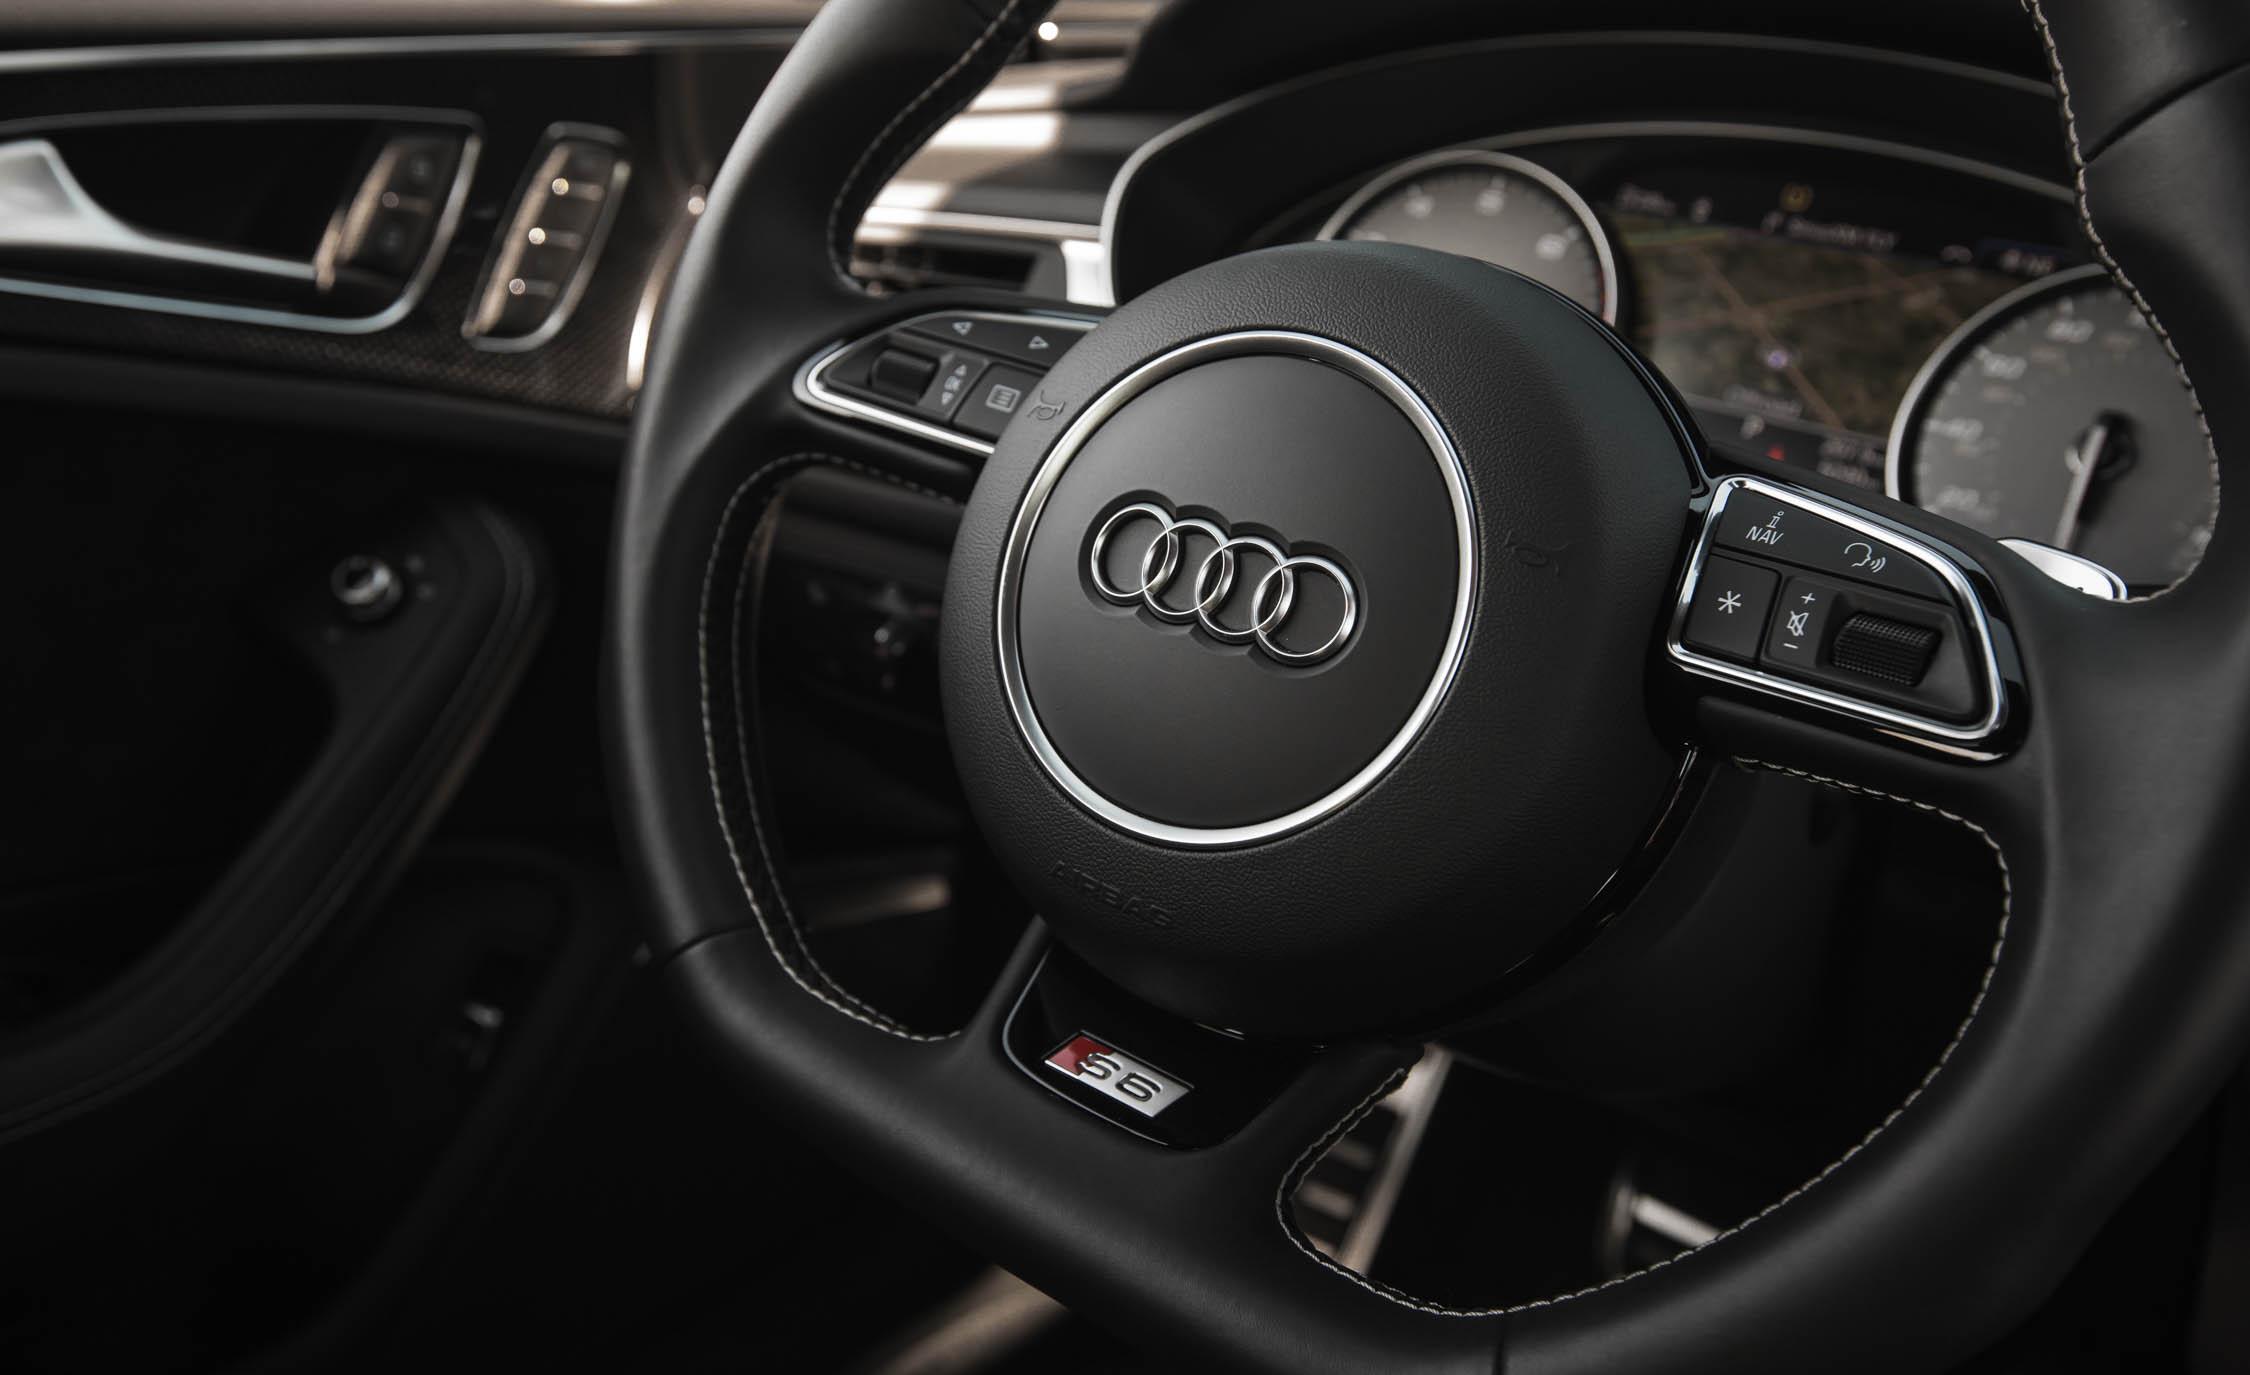 2016 Audi S6 Interior Steering